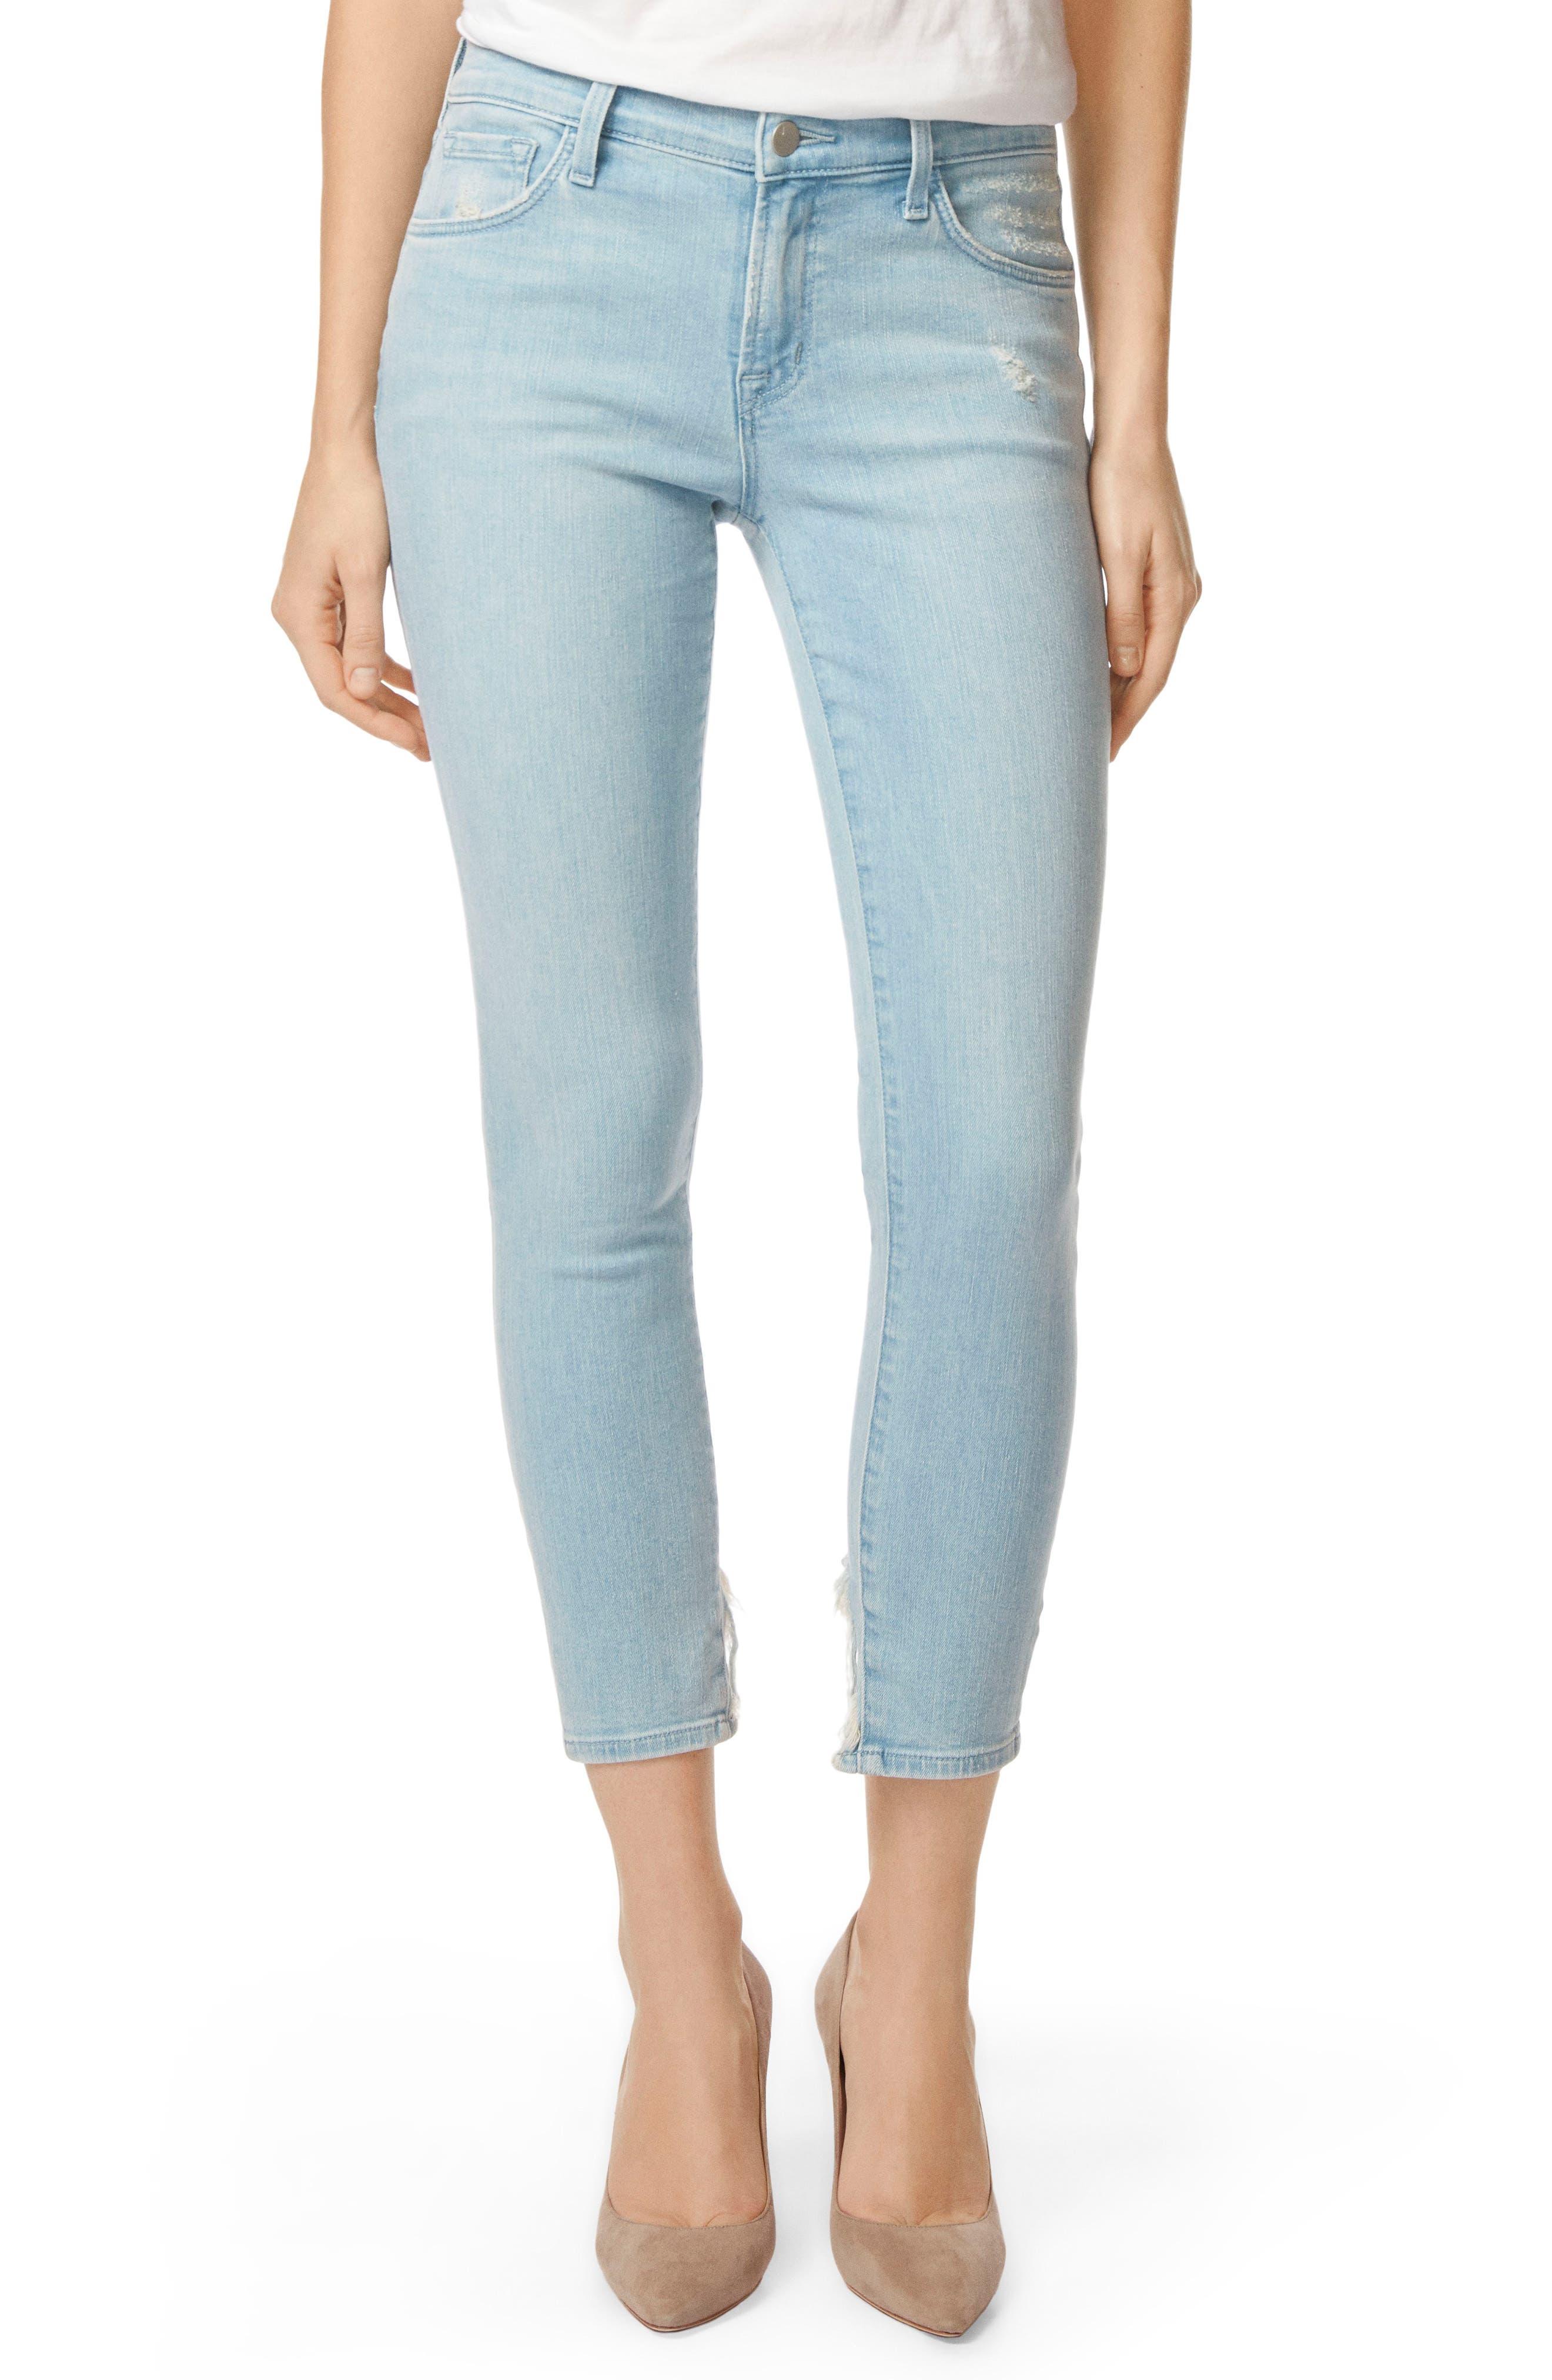 835 Capri Skinny Jeans,                             Main thumbnail 1, color,                             454